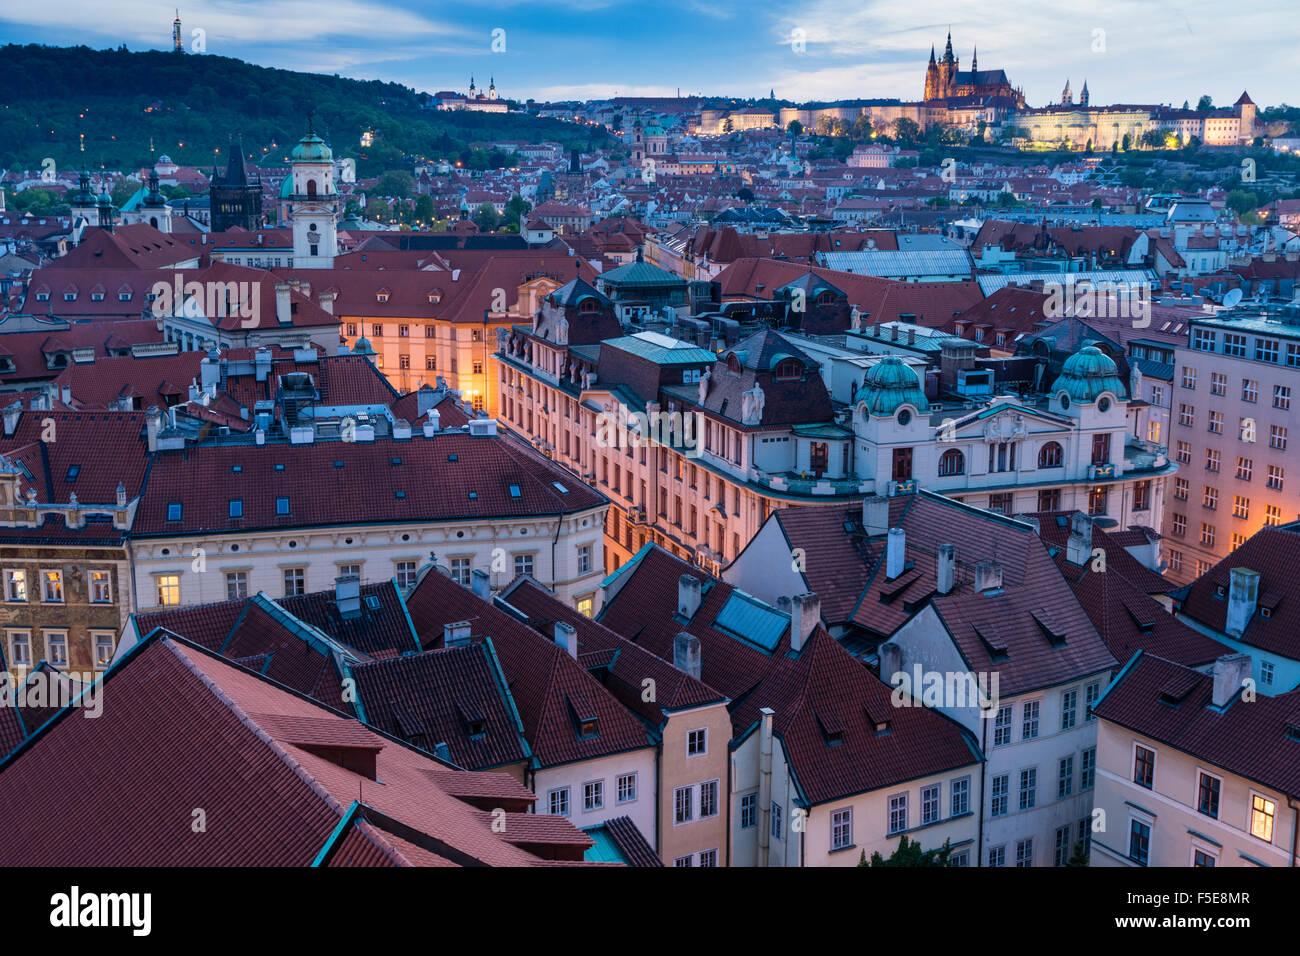 Blick über die Dächer der Altstadt in Richtung St.-Veits Dom bei Dämmerung, UNESCO-Weltkulturerbe, Stockbild